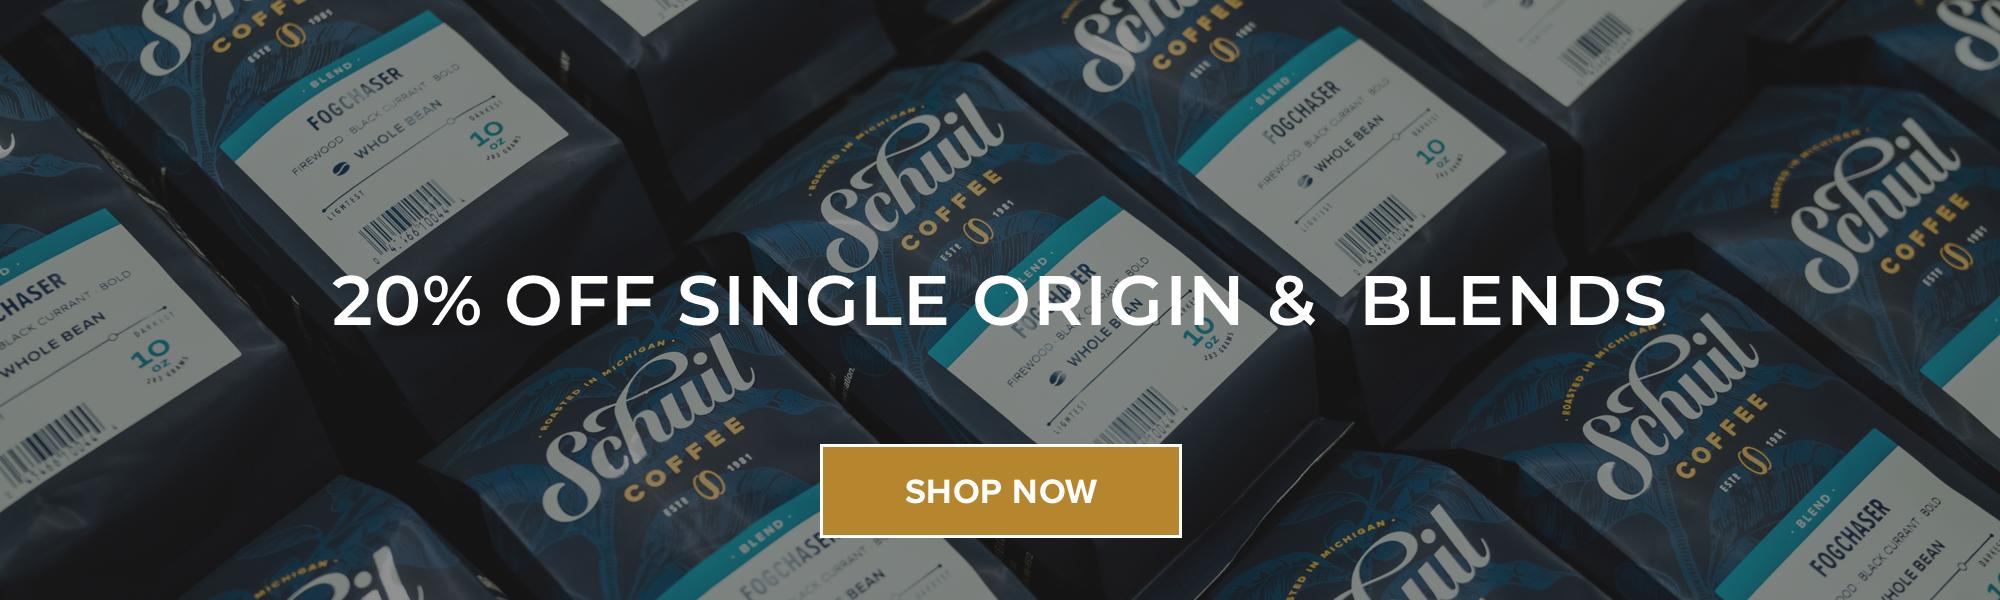 Schuil Coffee 20% Off Single Origin & Blends